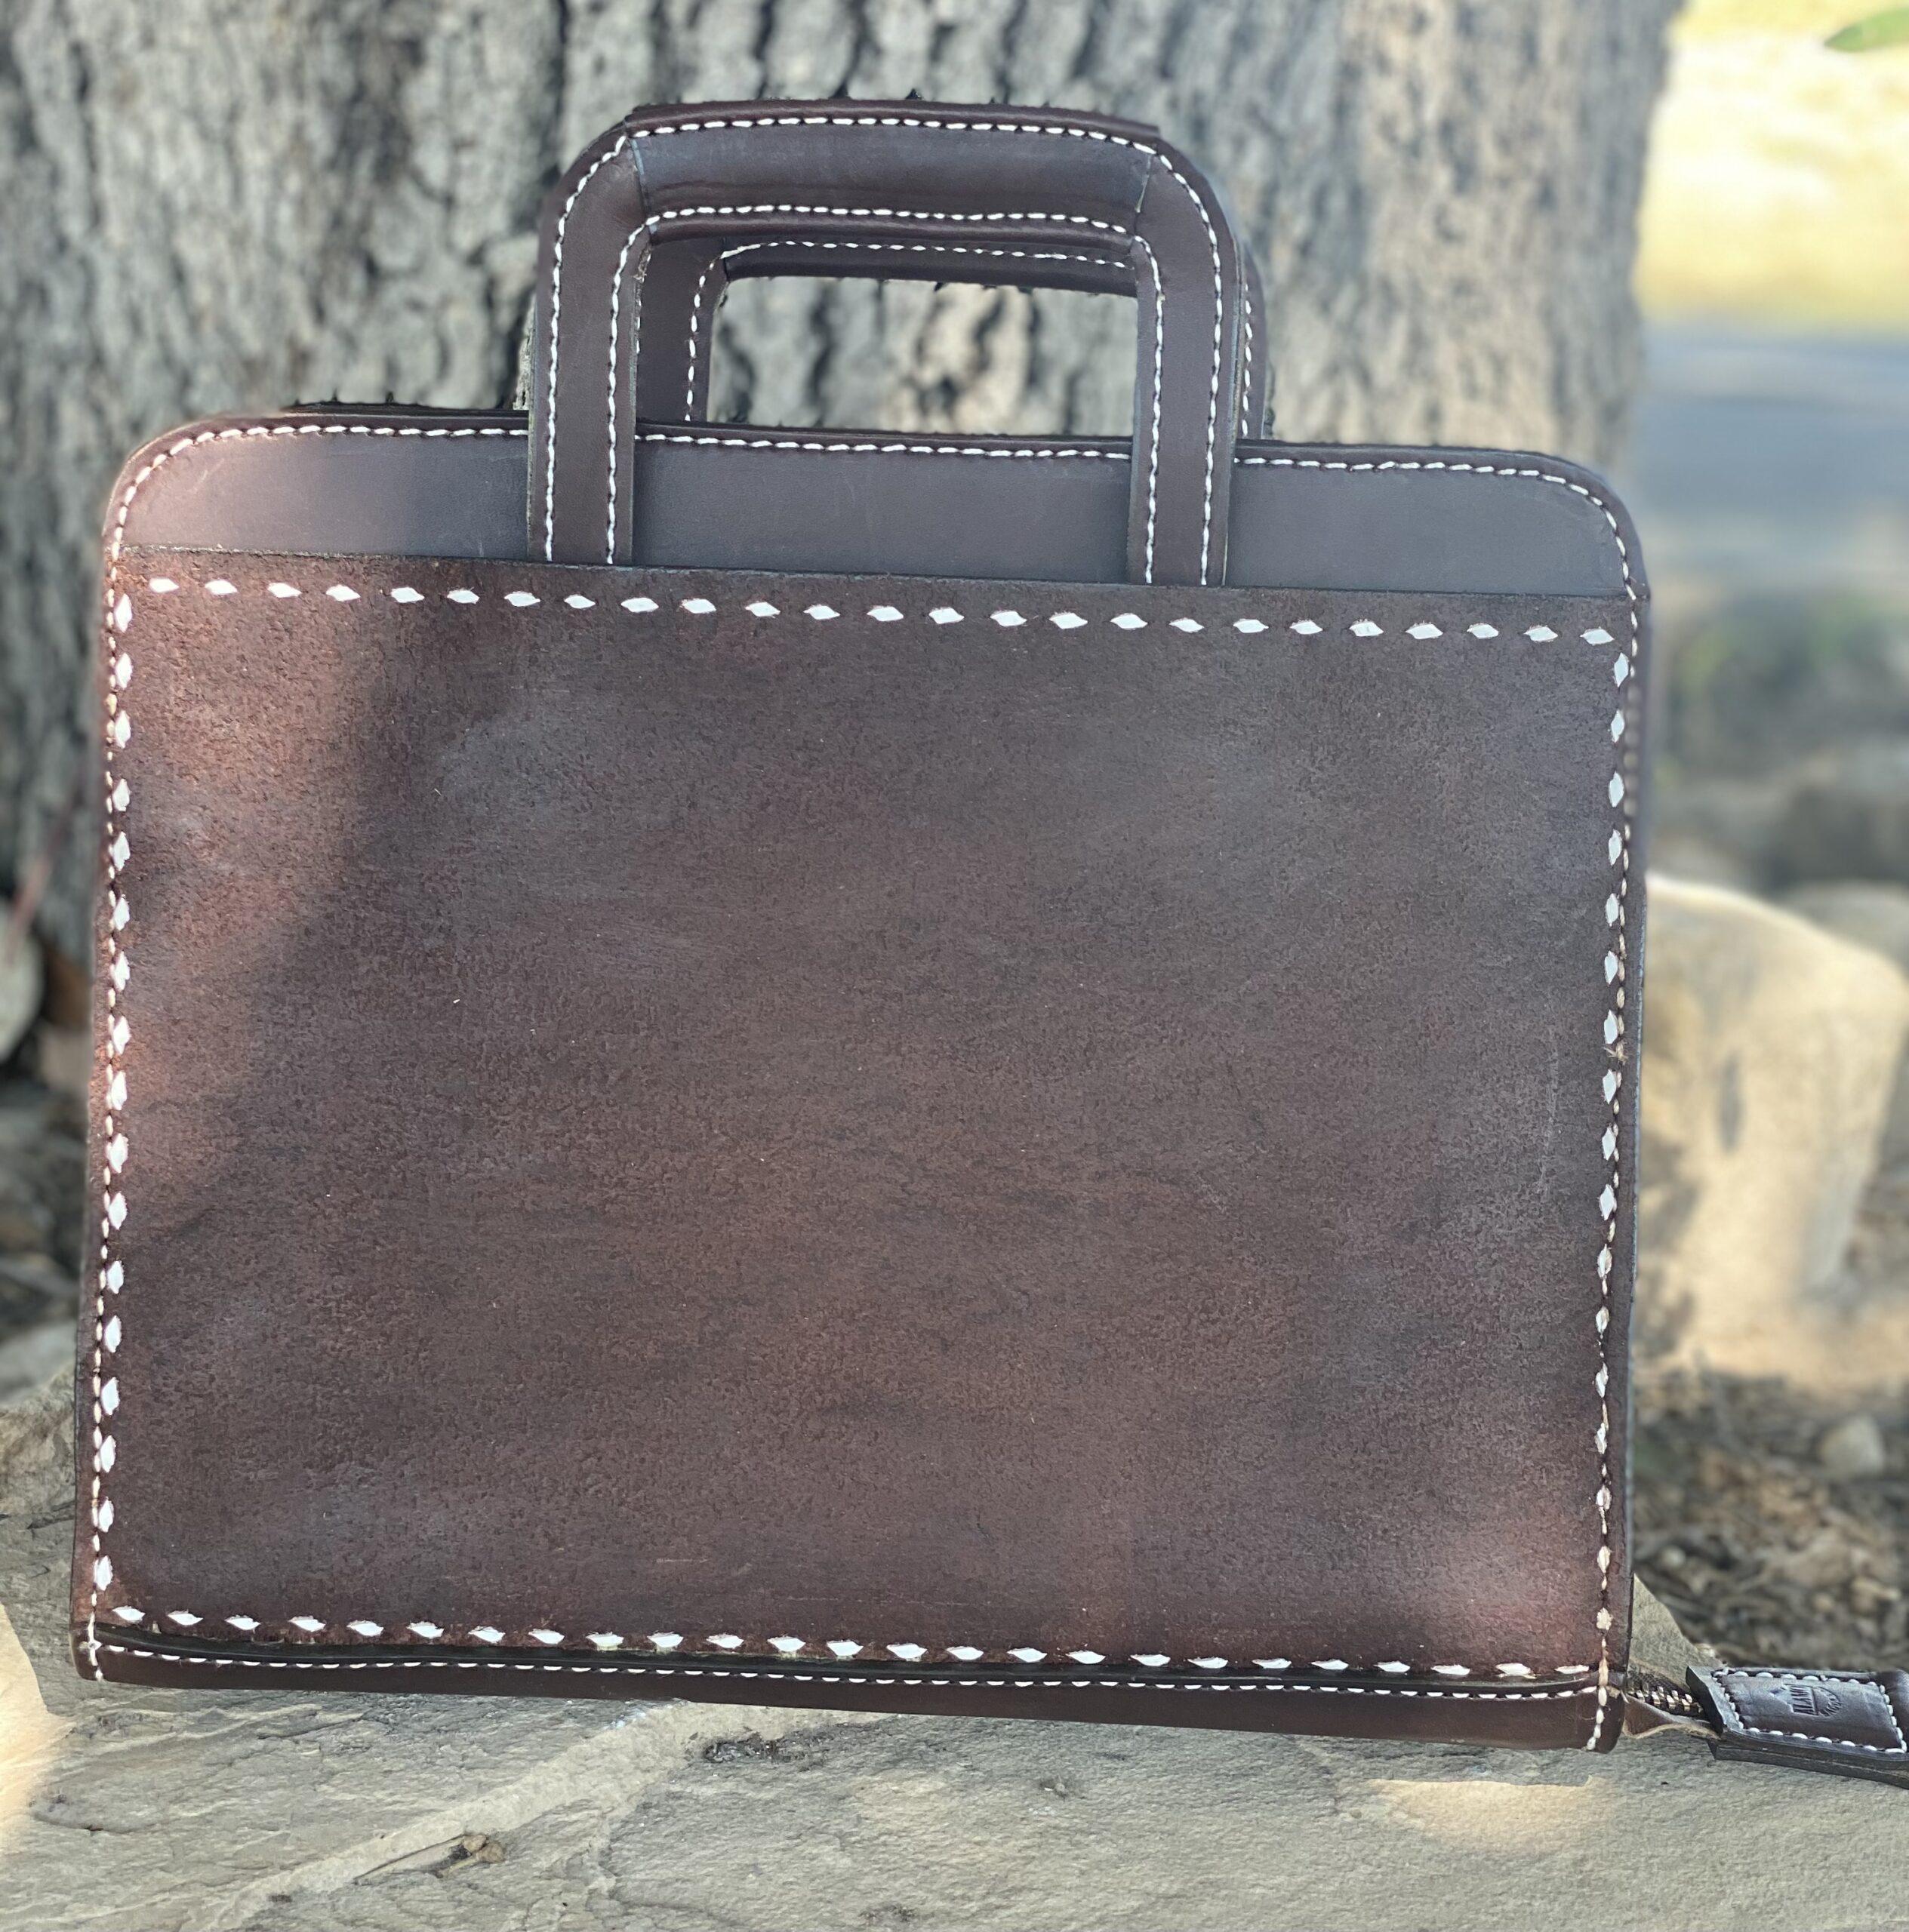 Cowboy Briefcase Chocolate Roughout w/ Buckstitch